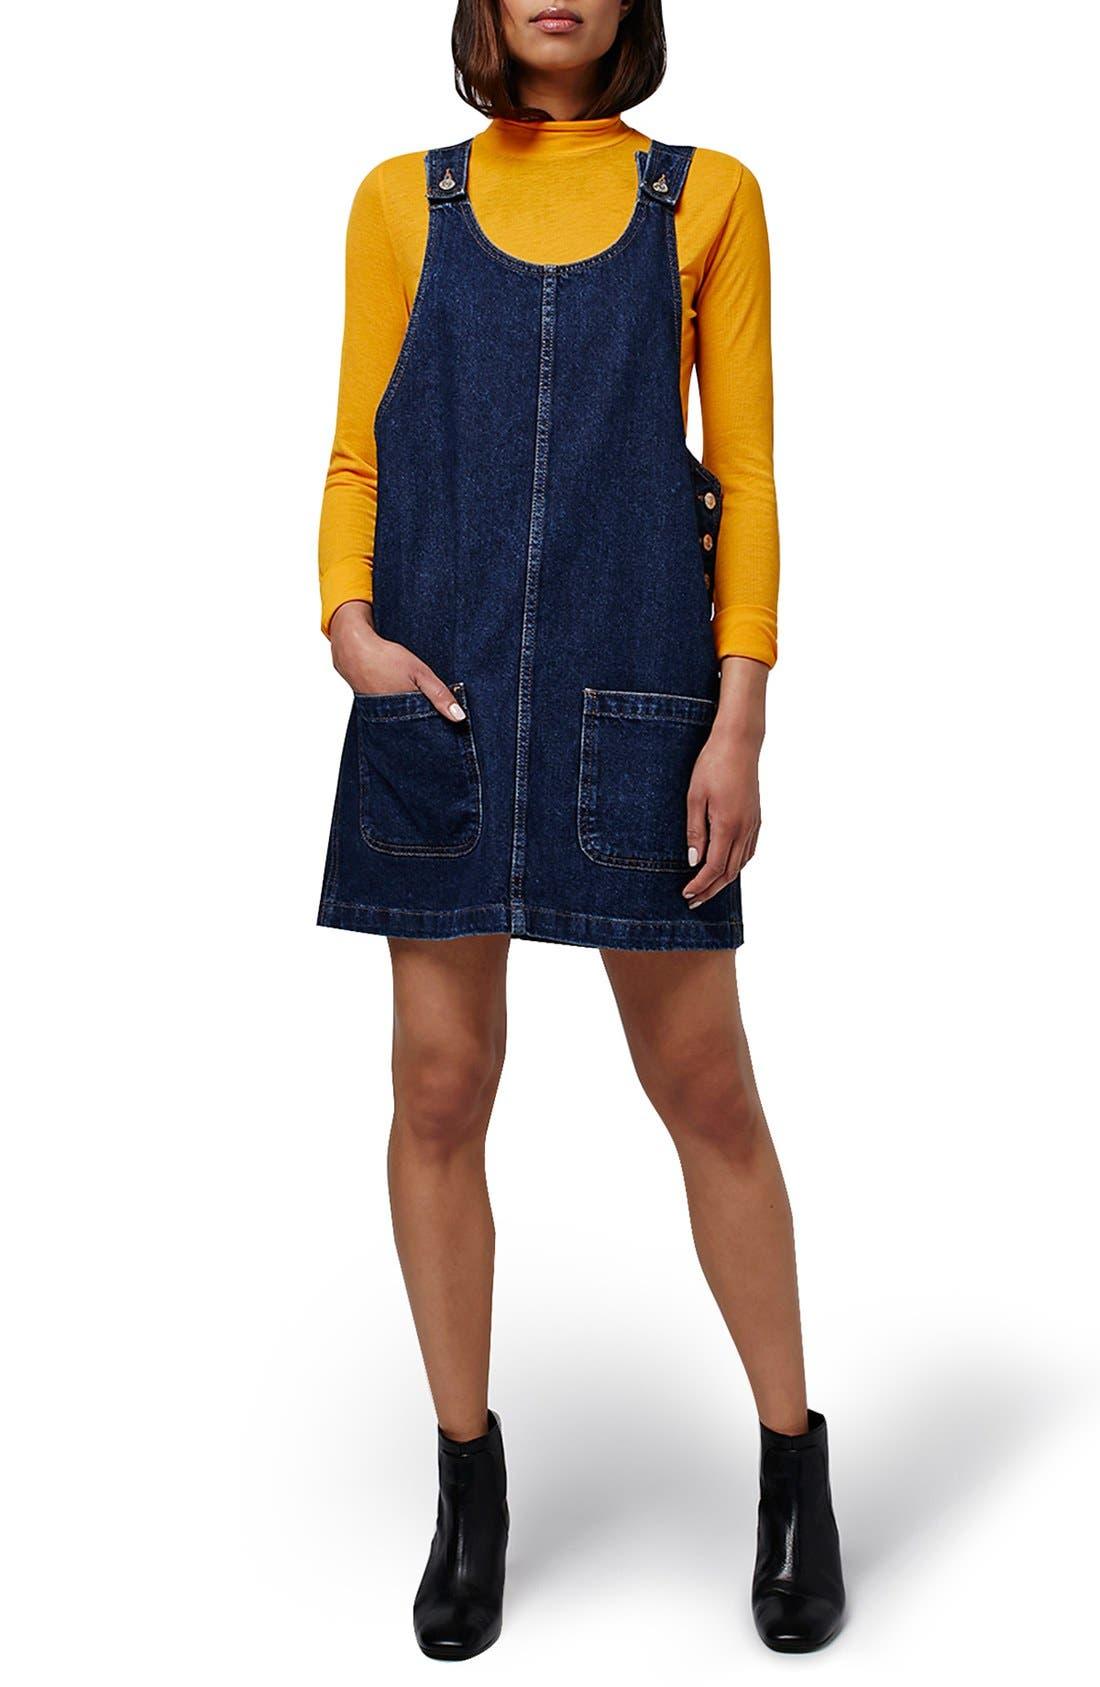 Alternate Image 1 Selected - Topshop Patch Pocket Denim Pinafore Dress